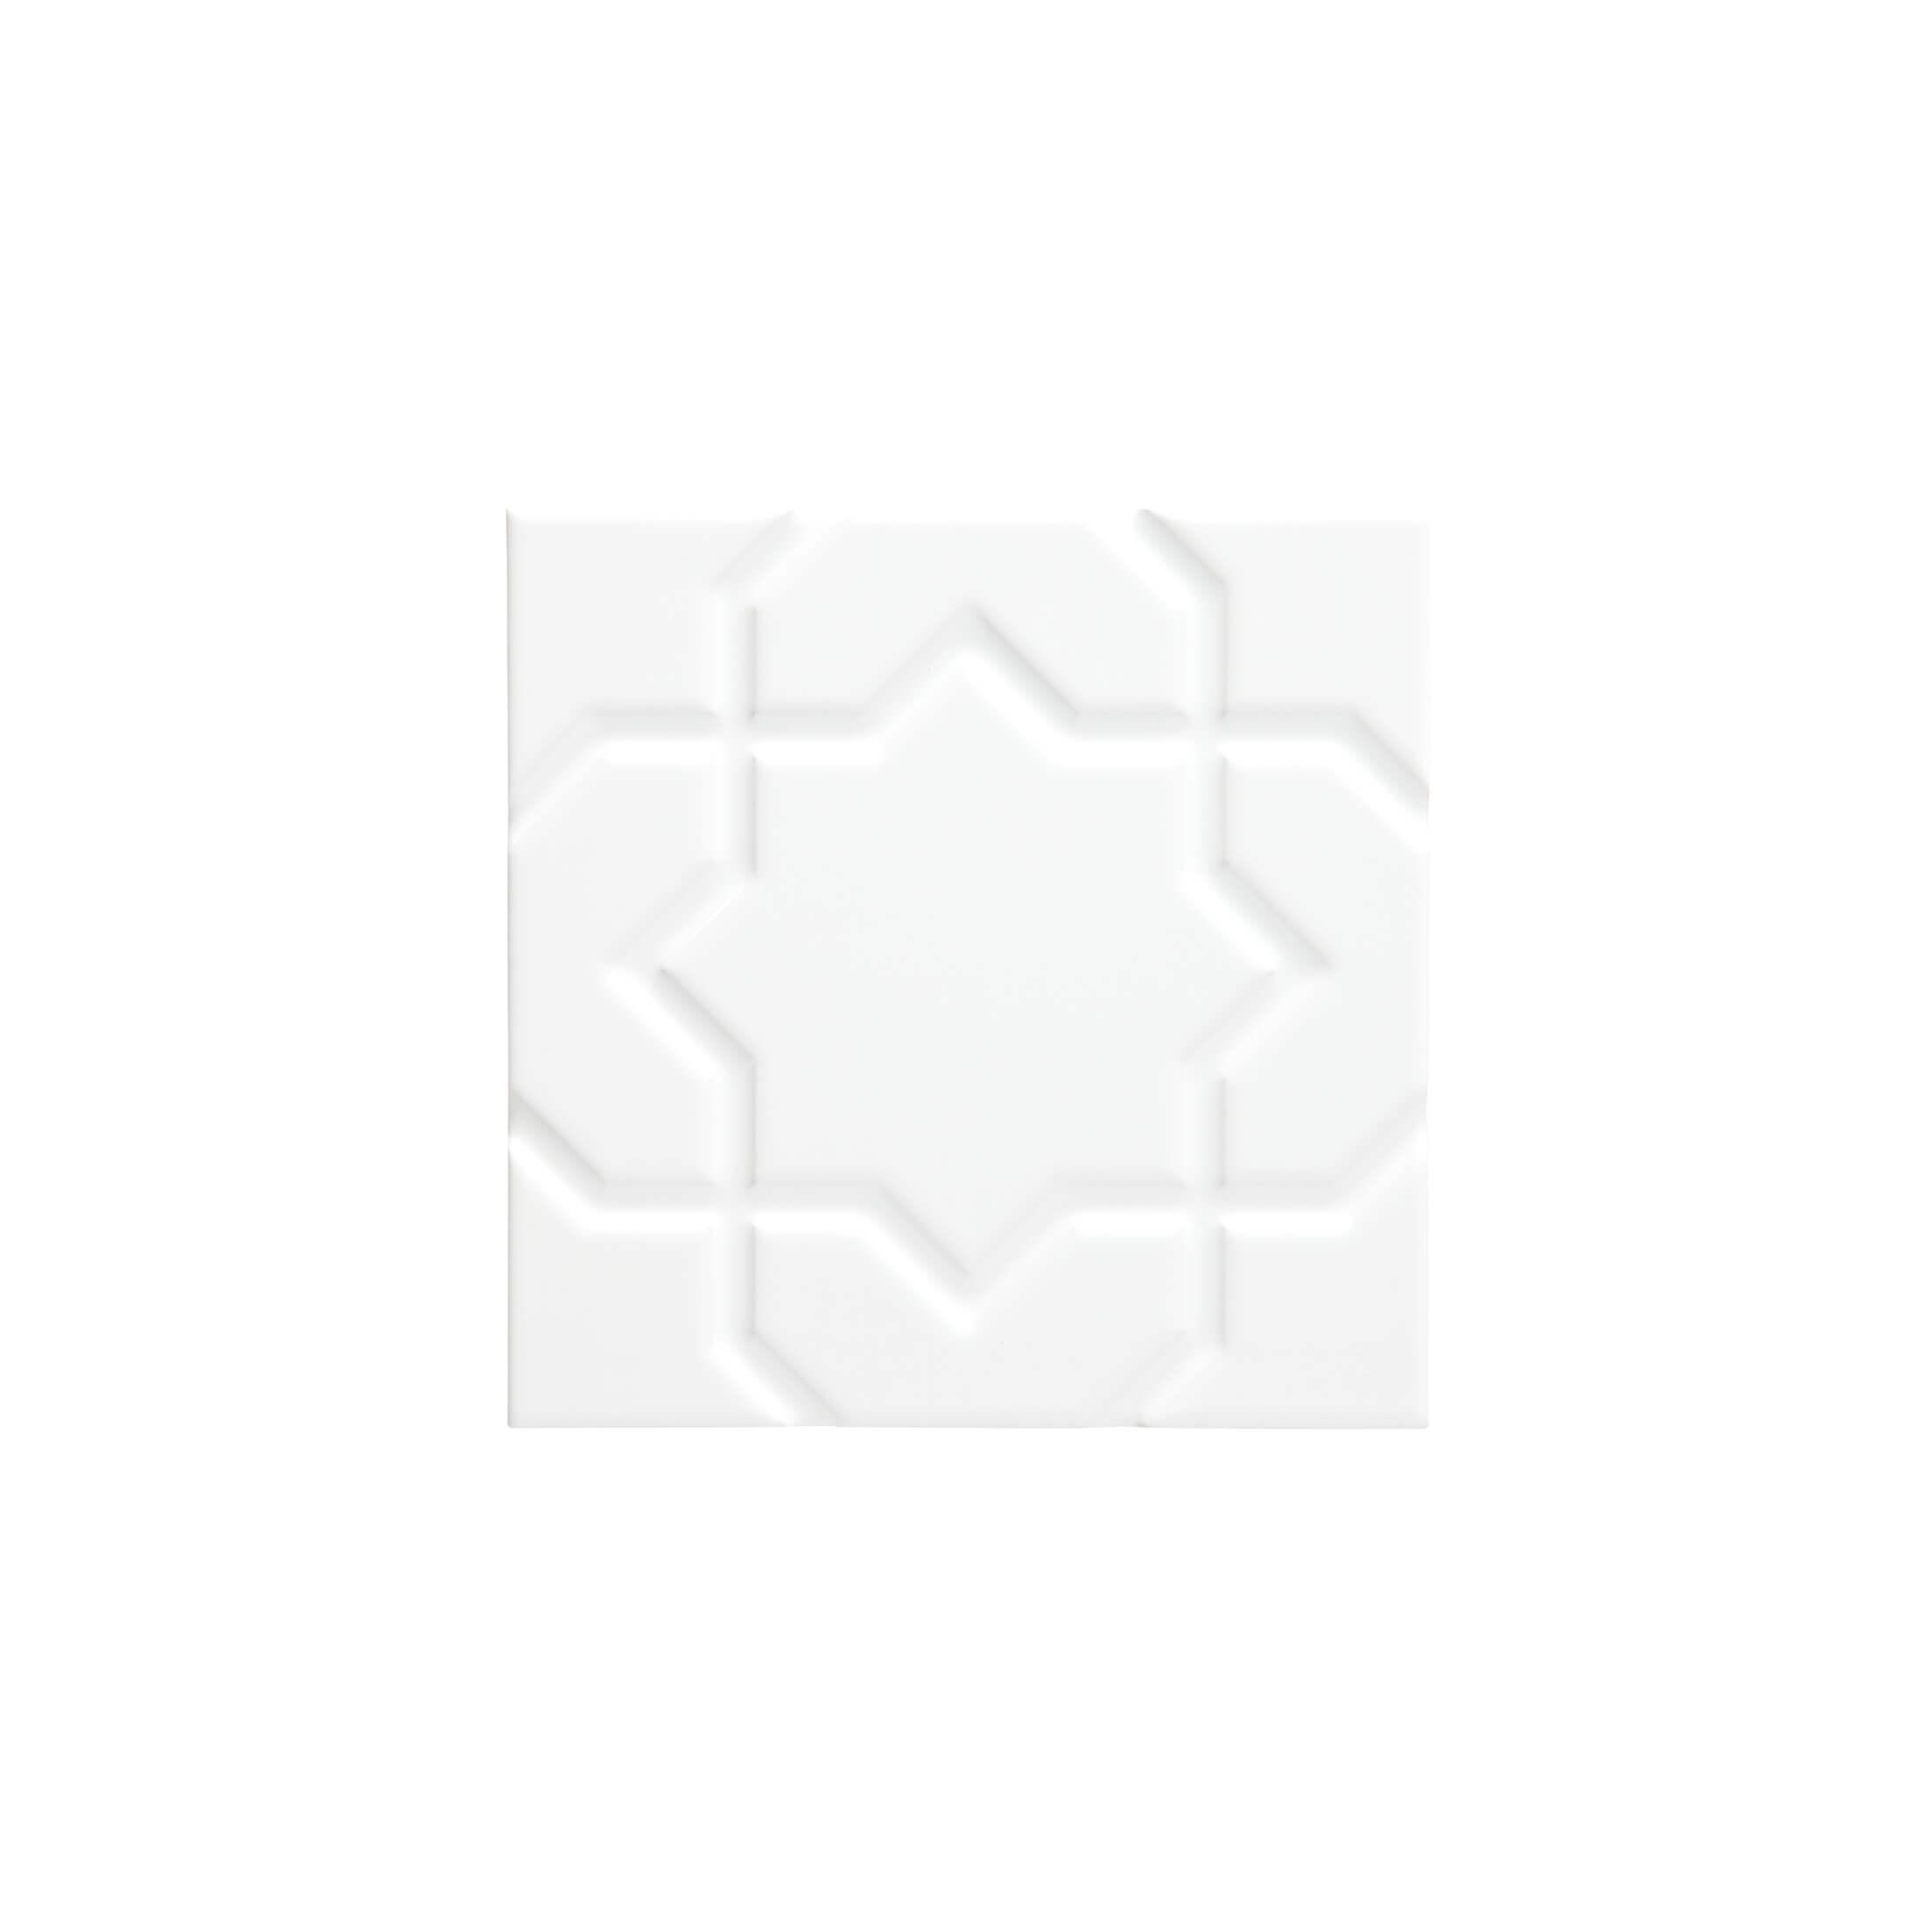 ADNE4151 - LISO STAR - 15 cm X 15 cm